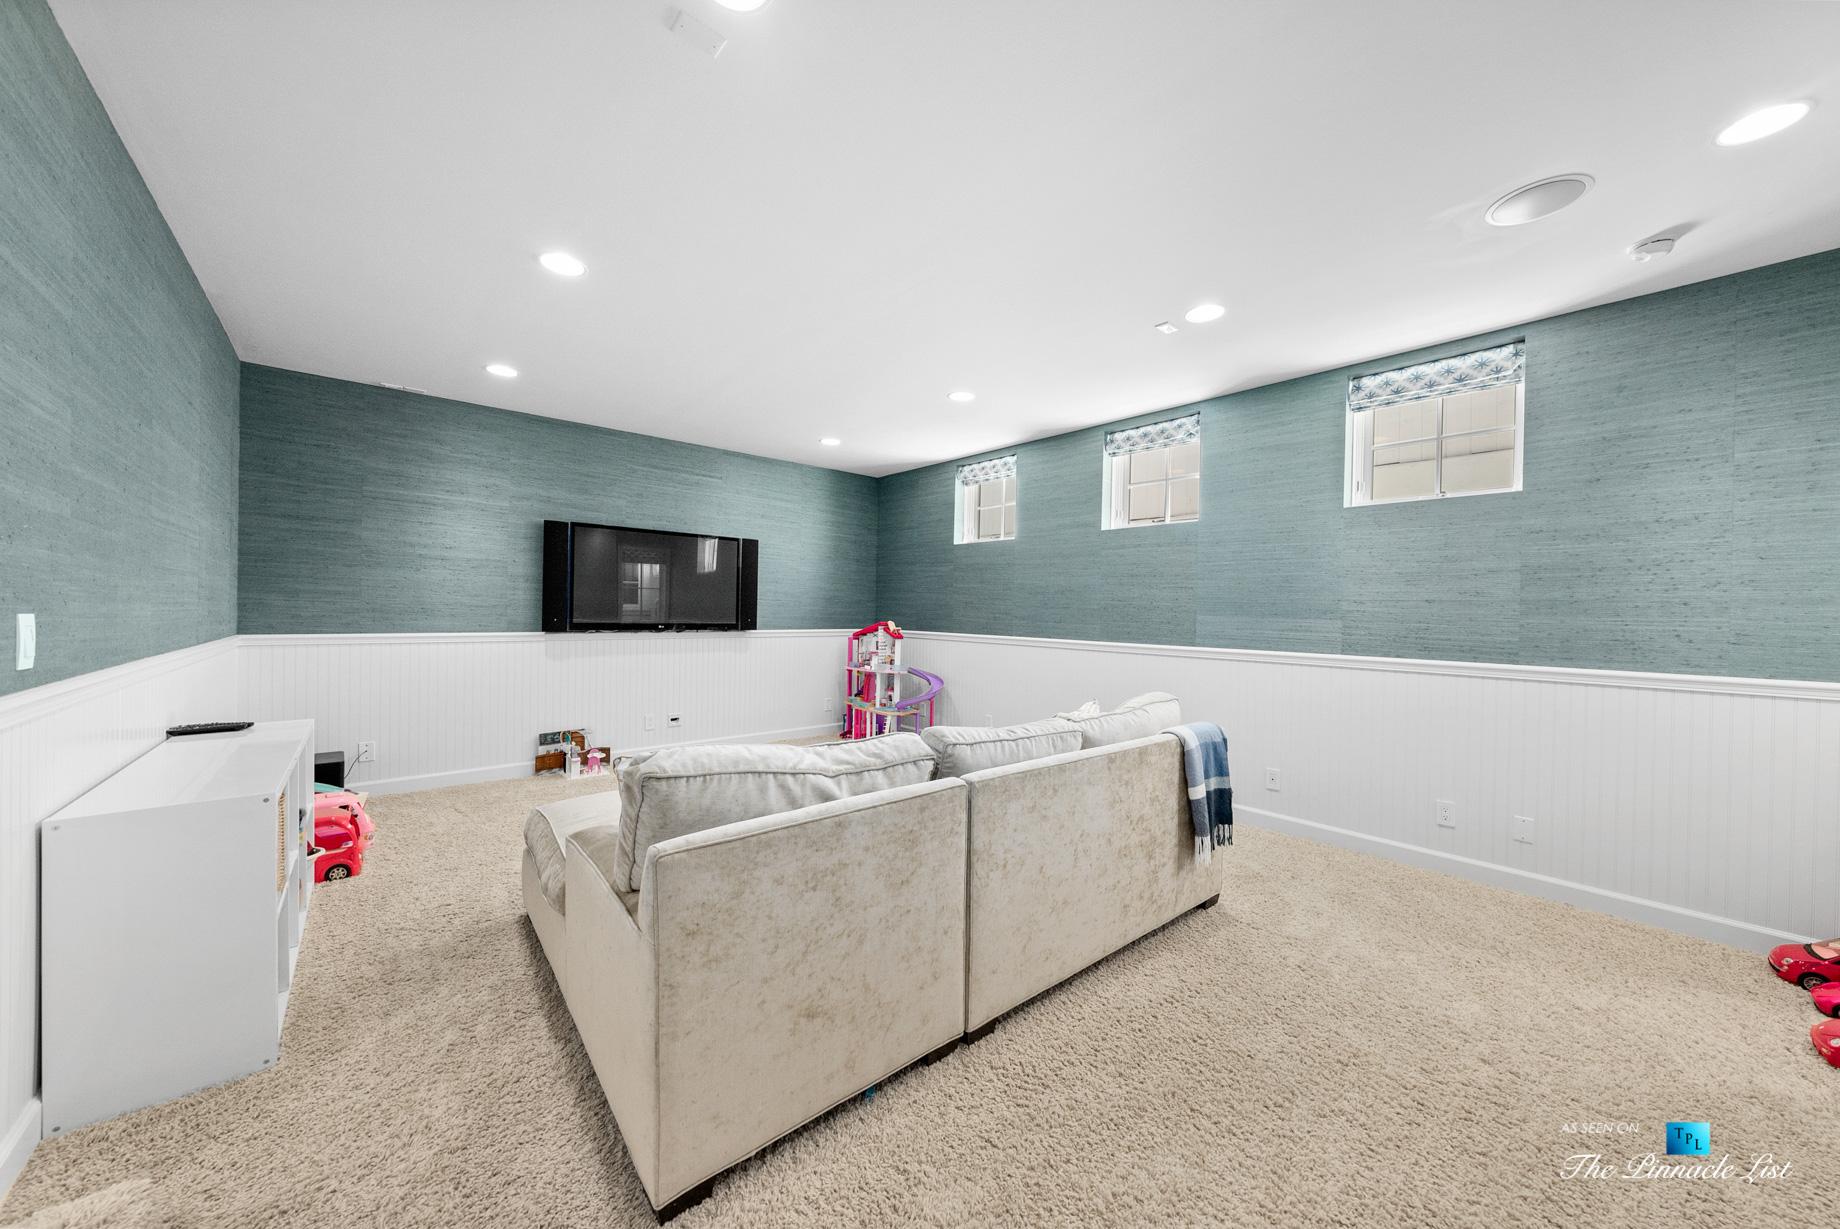 877 8th Street, Manhattan Beach, CA, USA – Basement Recreation Room